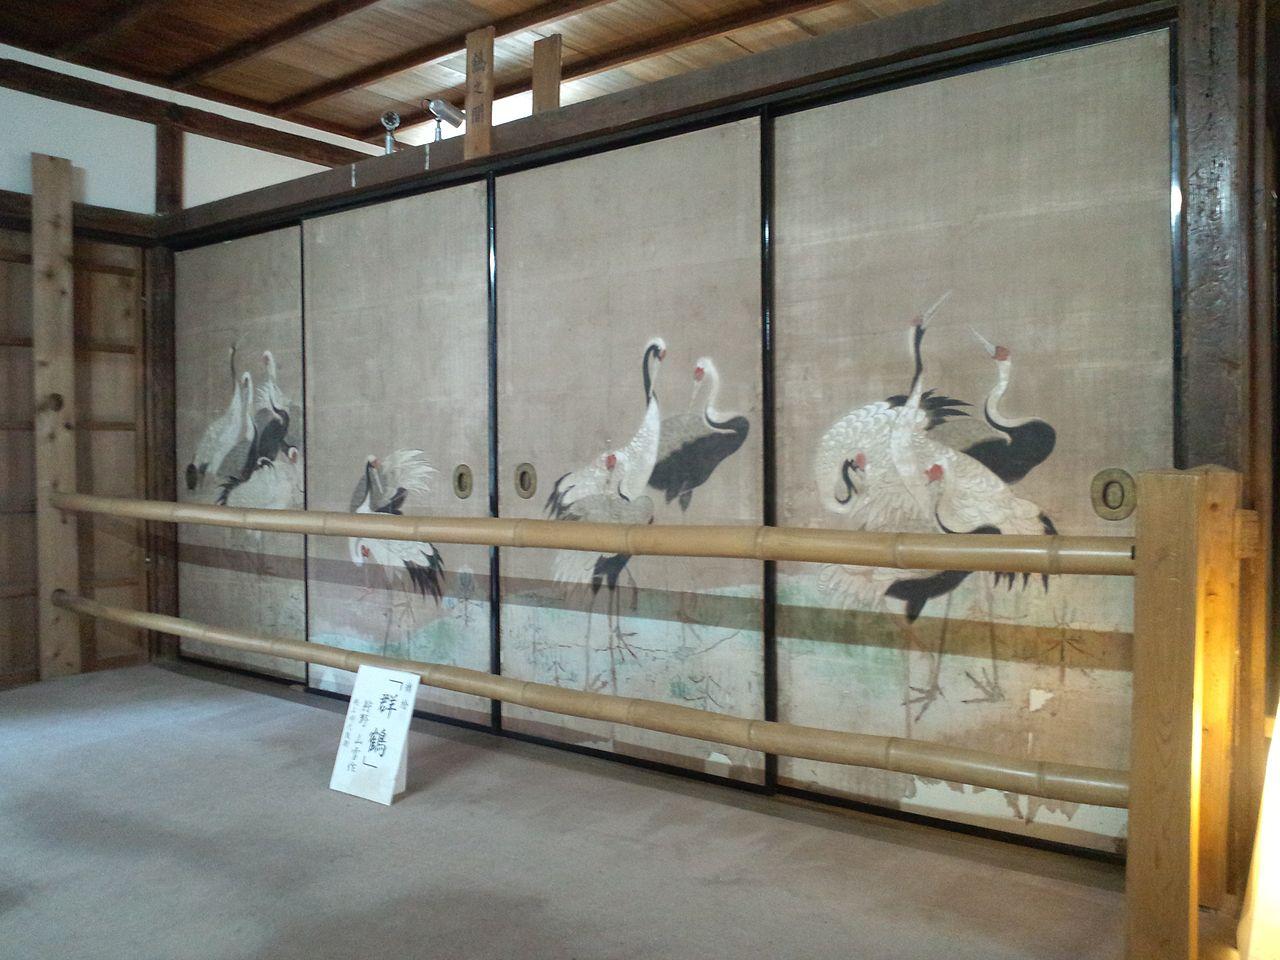 сансецу1280px-Yoshimizu-Shrine_Indoors_of_shoin_1.jpg